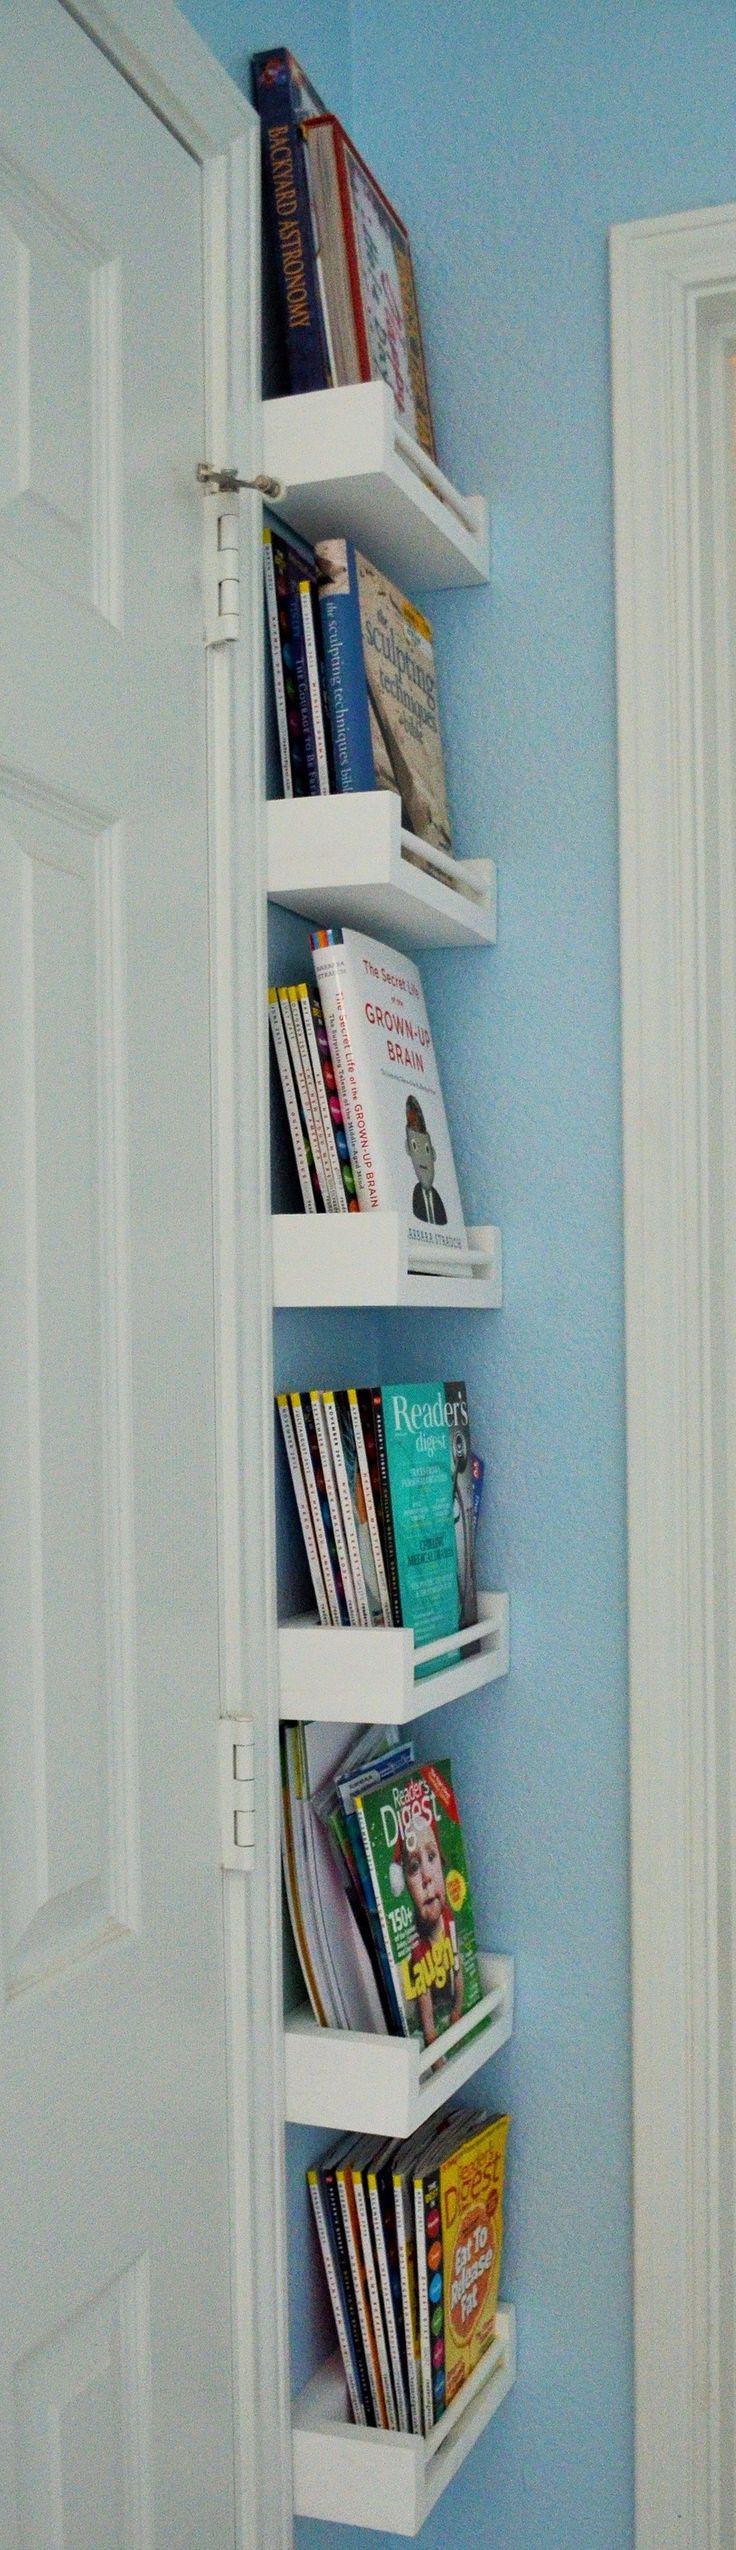 Best 25+ Kid book storage ideas on Pinterest | Ikea ...